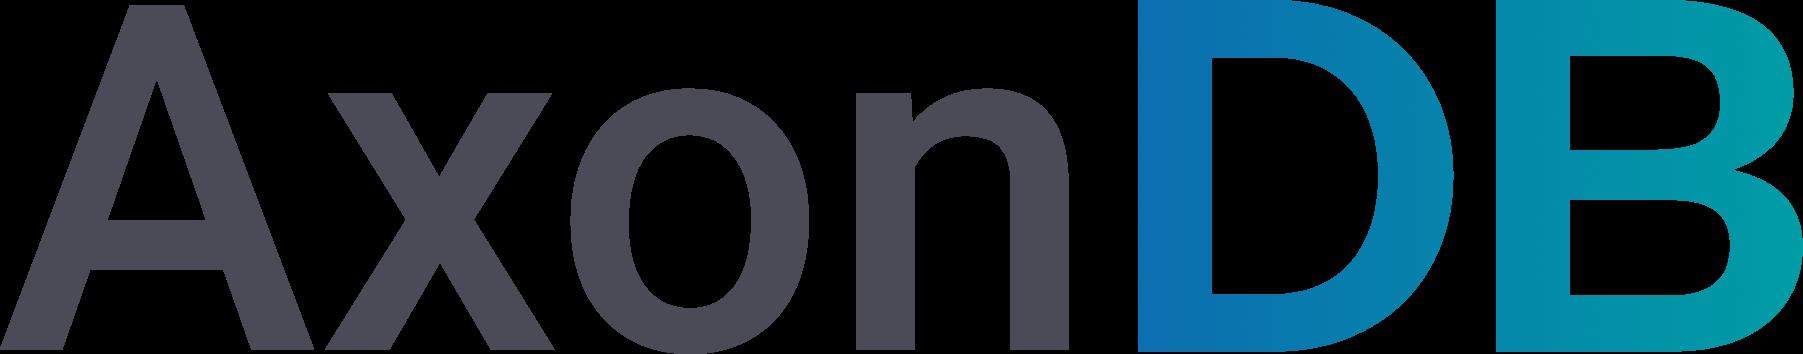 AxonDB logo